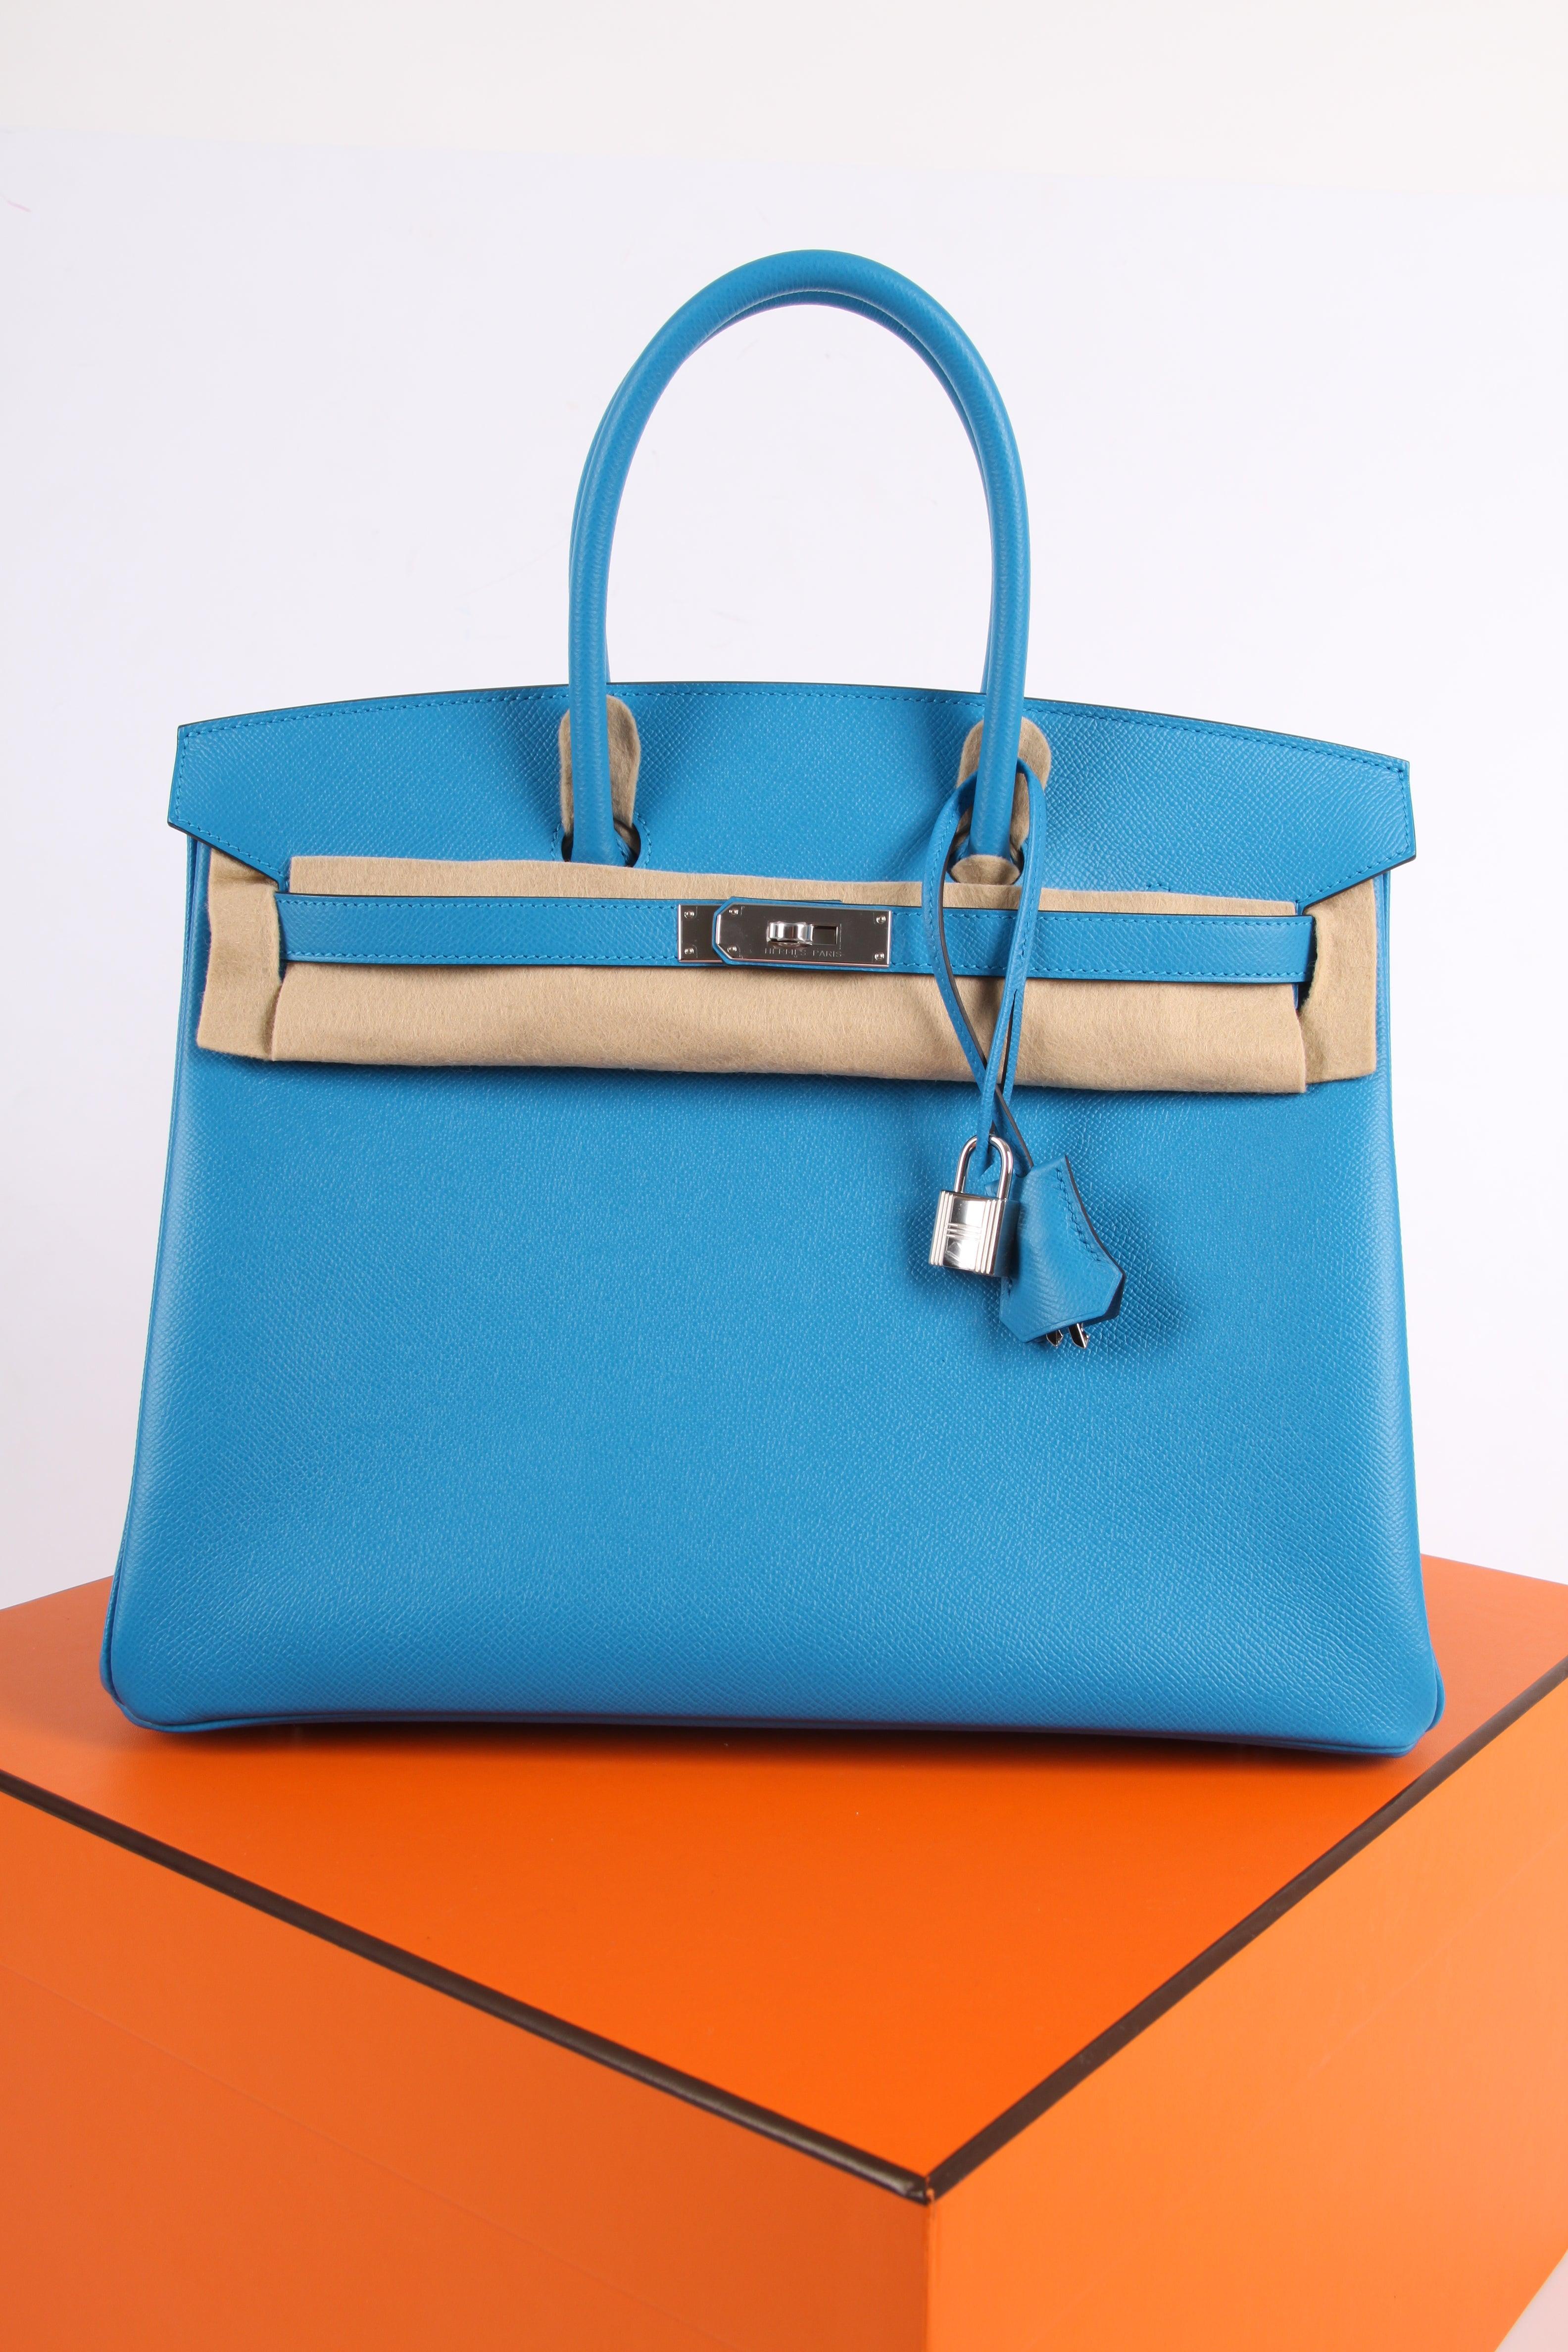 aa204f222eec Hermes Birkin Bag Epsom 35 Bleu Zanzibar Palladium Hardware - blue For Sale  at 1stdibs